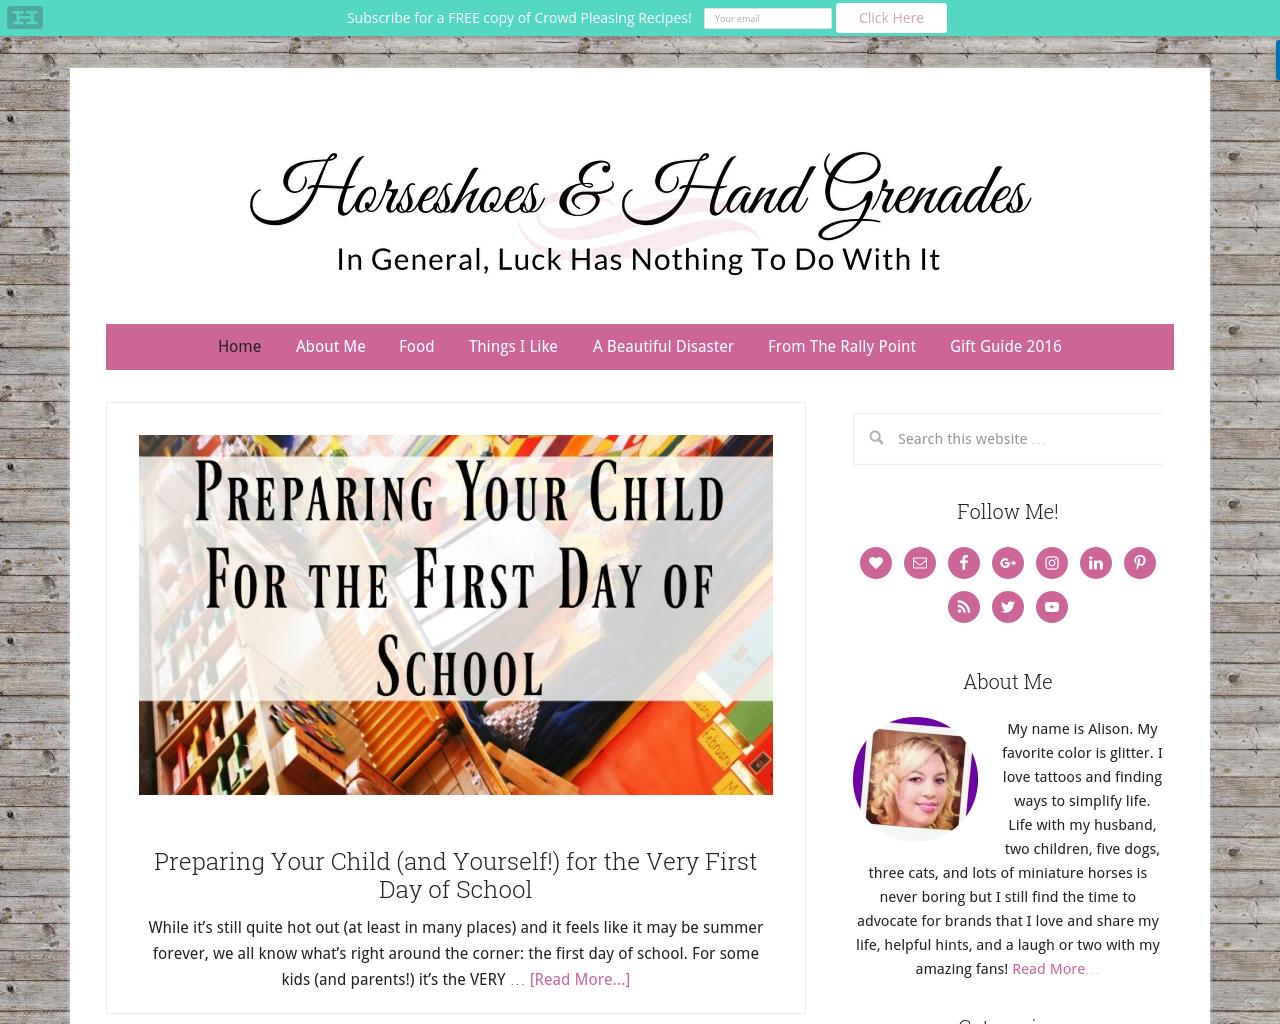 Horseshoes-&-Hand-Grenades-Advertising-Reviews-Pricing